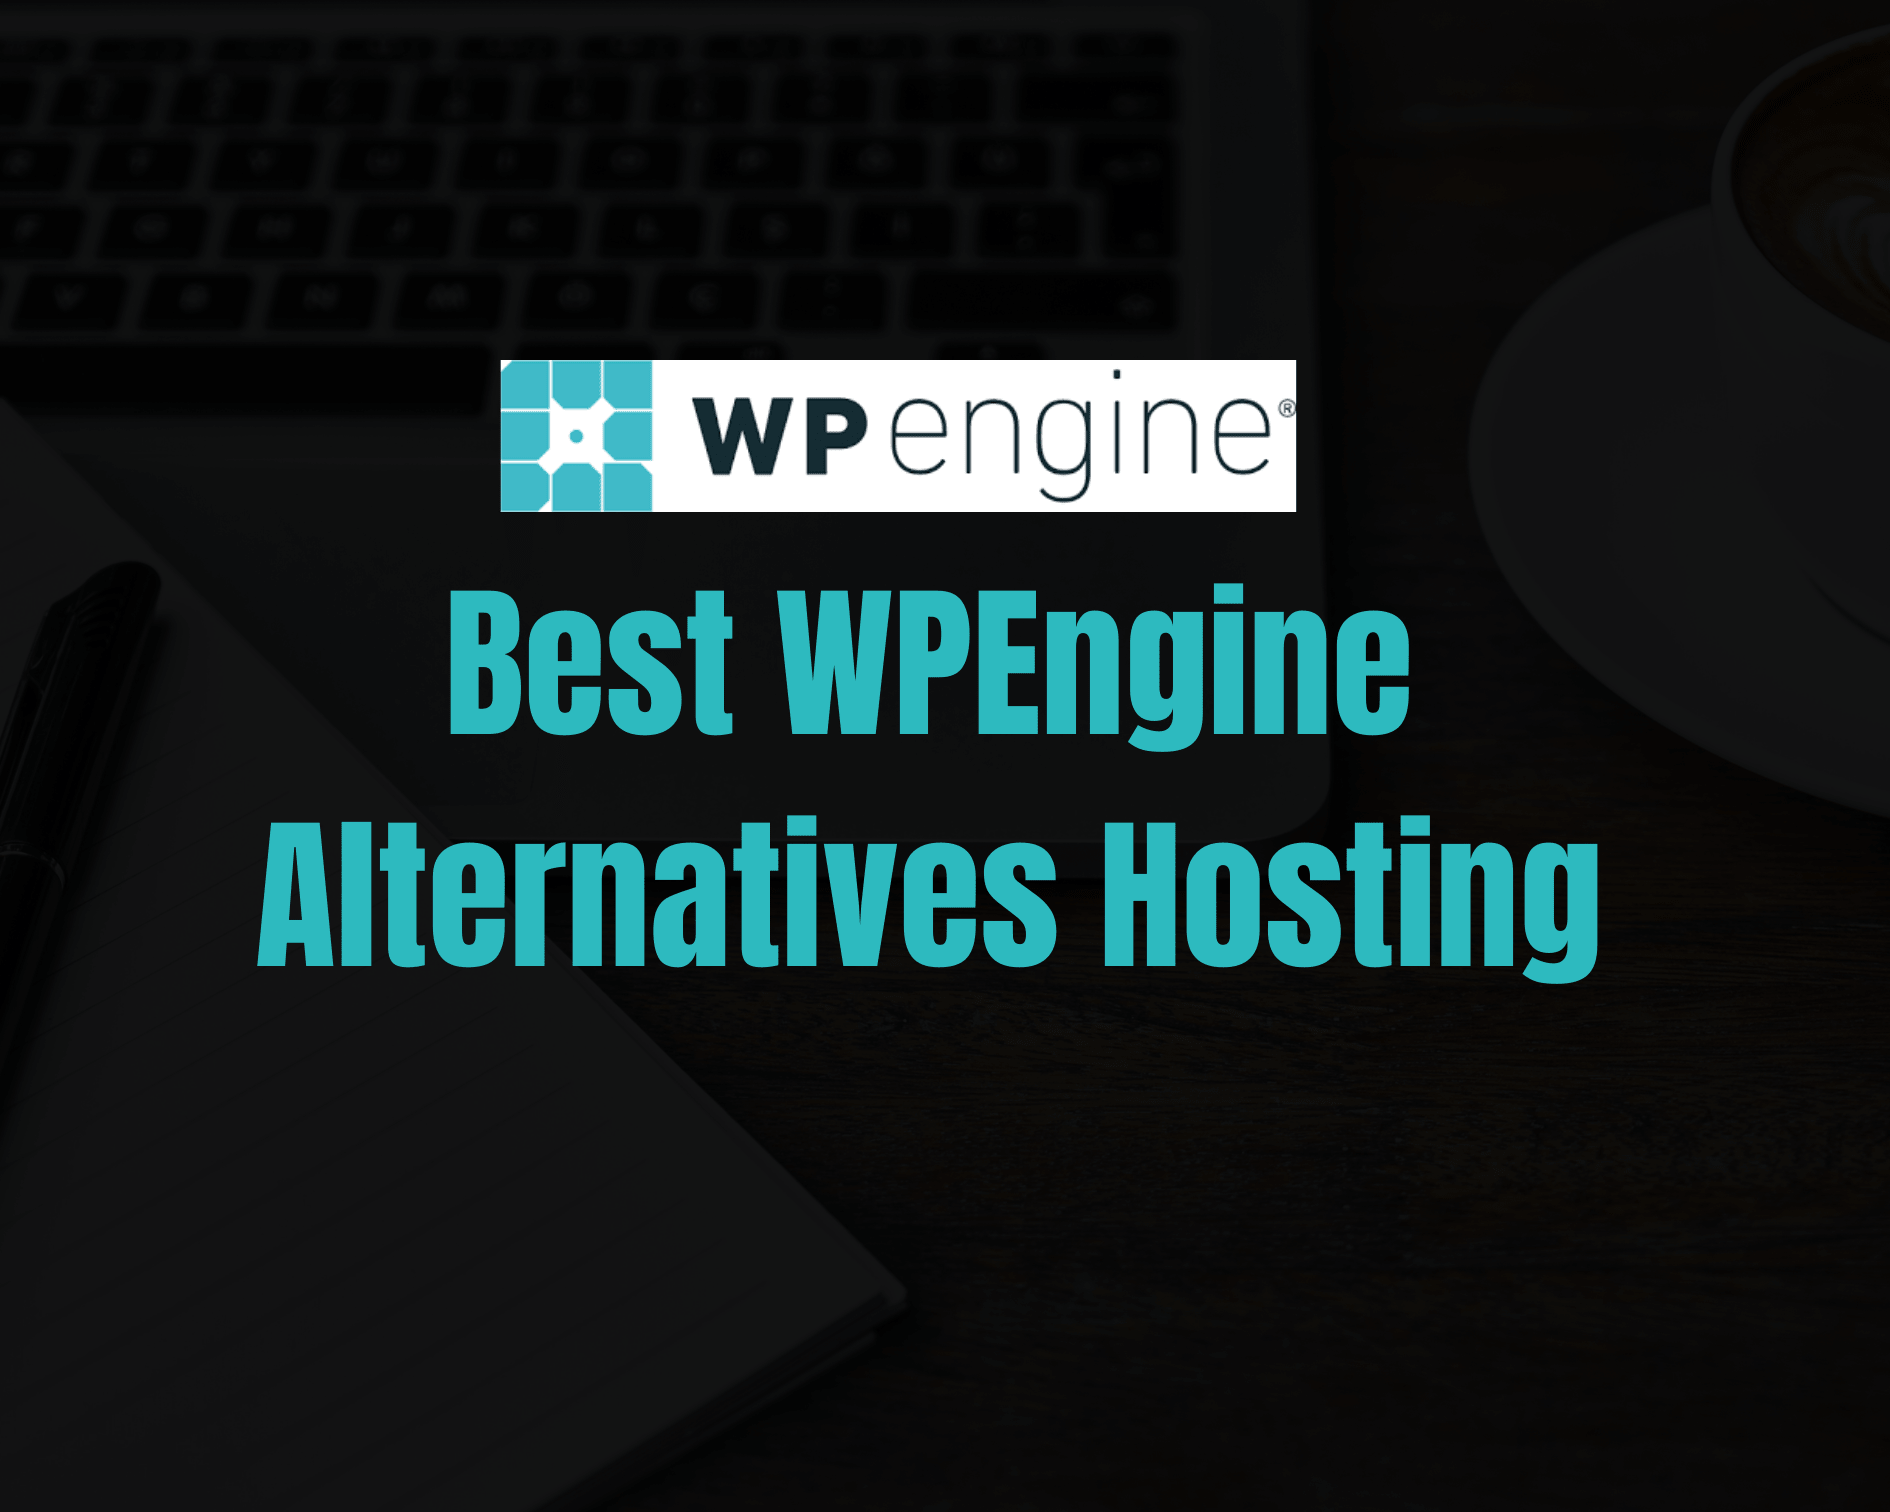 Top 8 Best WPEngine Alternatives Hosting in 2021